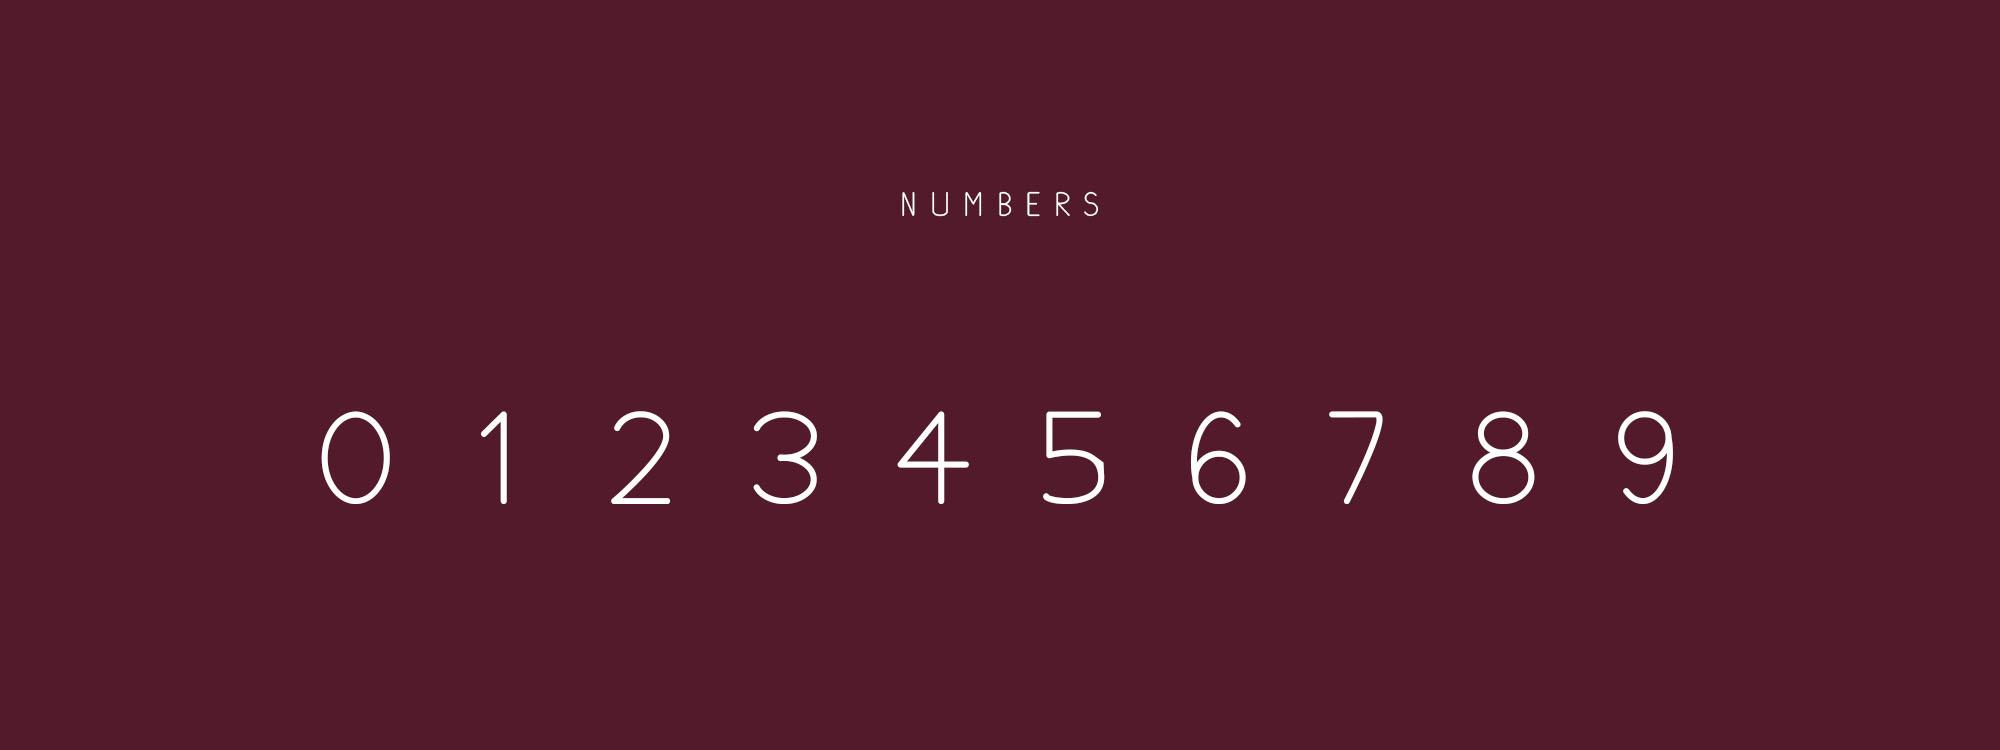 Plum Typeface Numbers